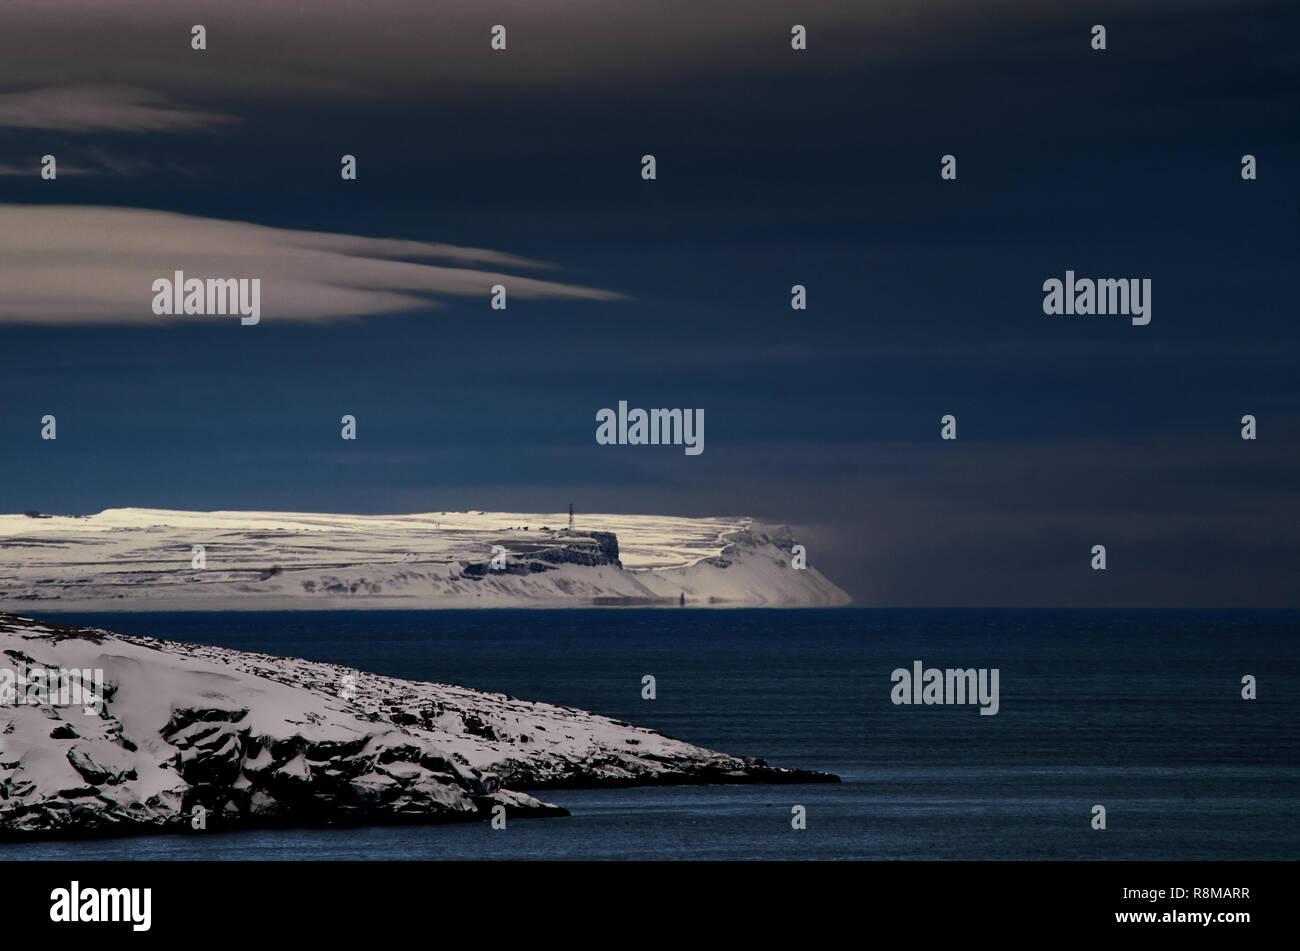 Frosty night landscape the Arctic Ocean. Northern severe cold nature cliffs. Dark deep blue water and sky, white clouds, black rocky coast shore. The Barents Sea, Kola peninsula Teriberka, Russia. - Stock Image